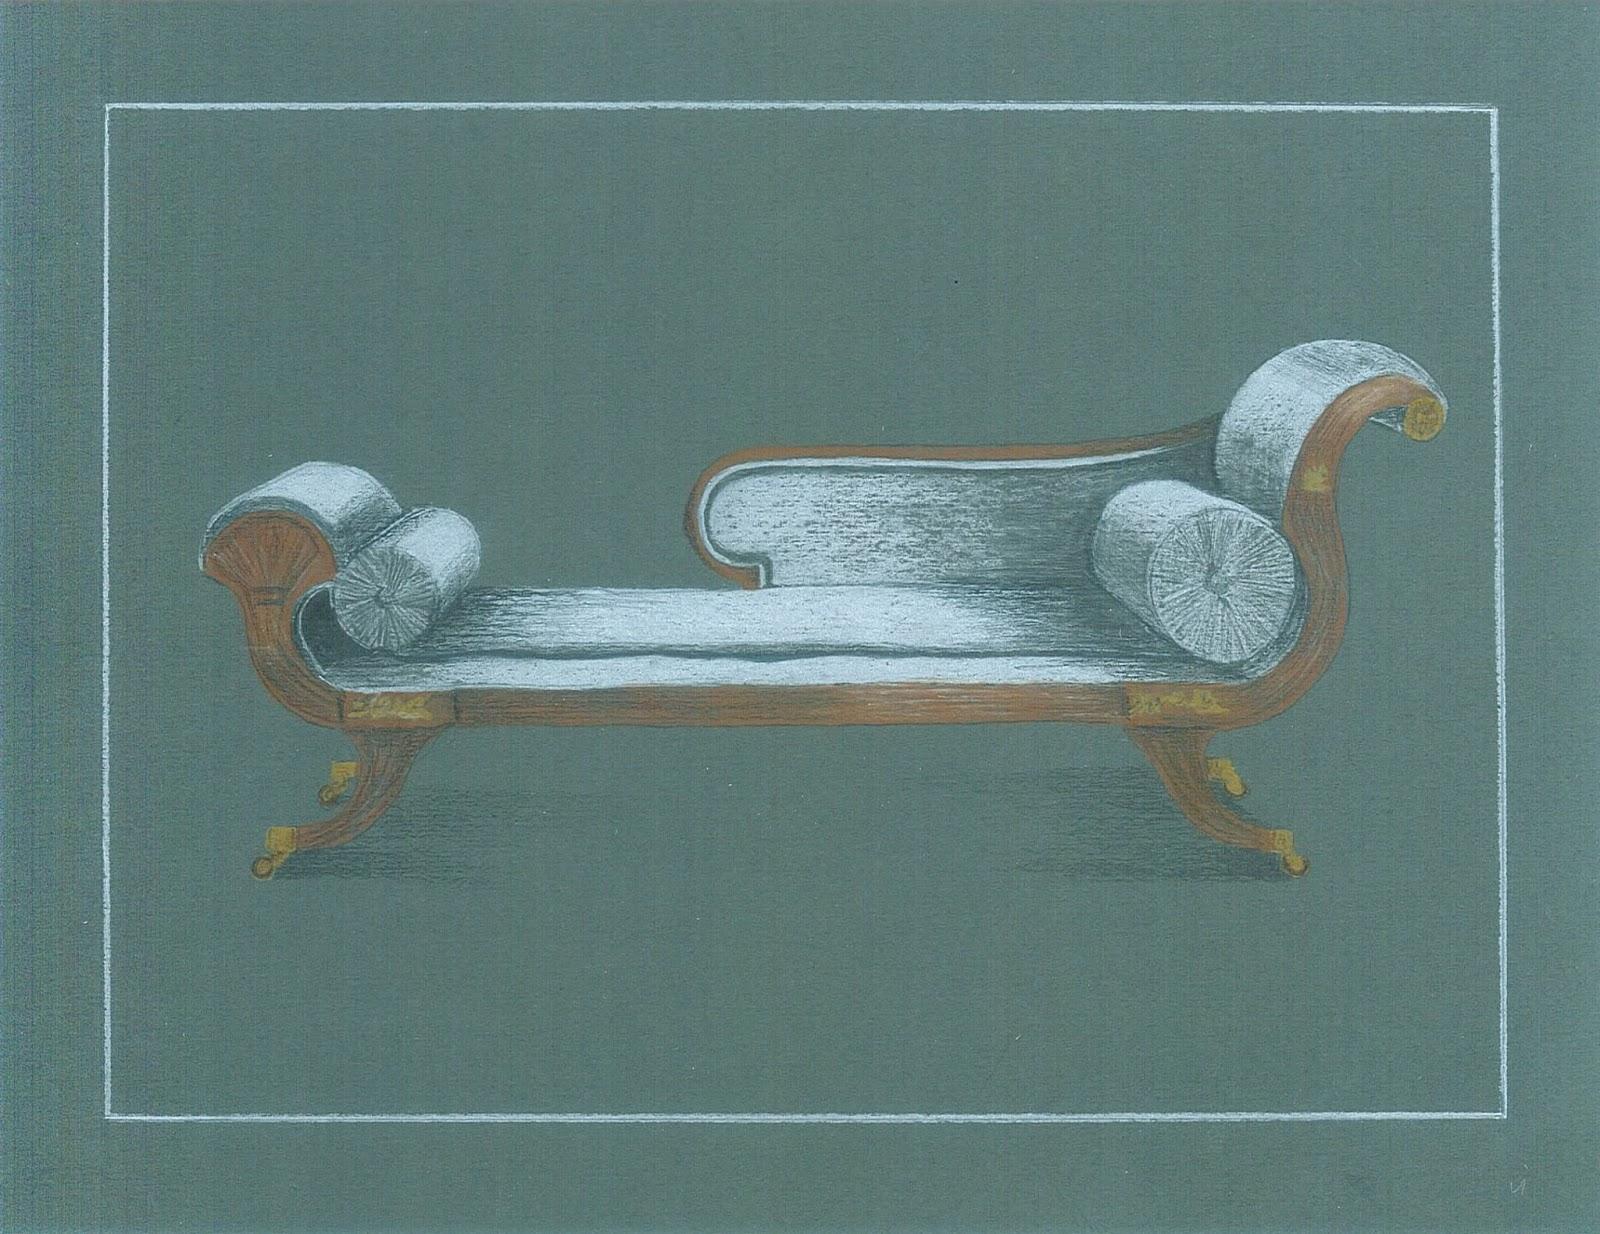 Descubriendo Julio 2015 # Muebles Neoclasicos